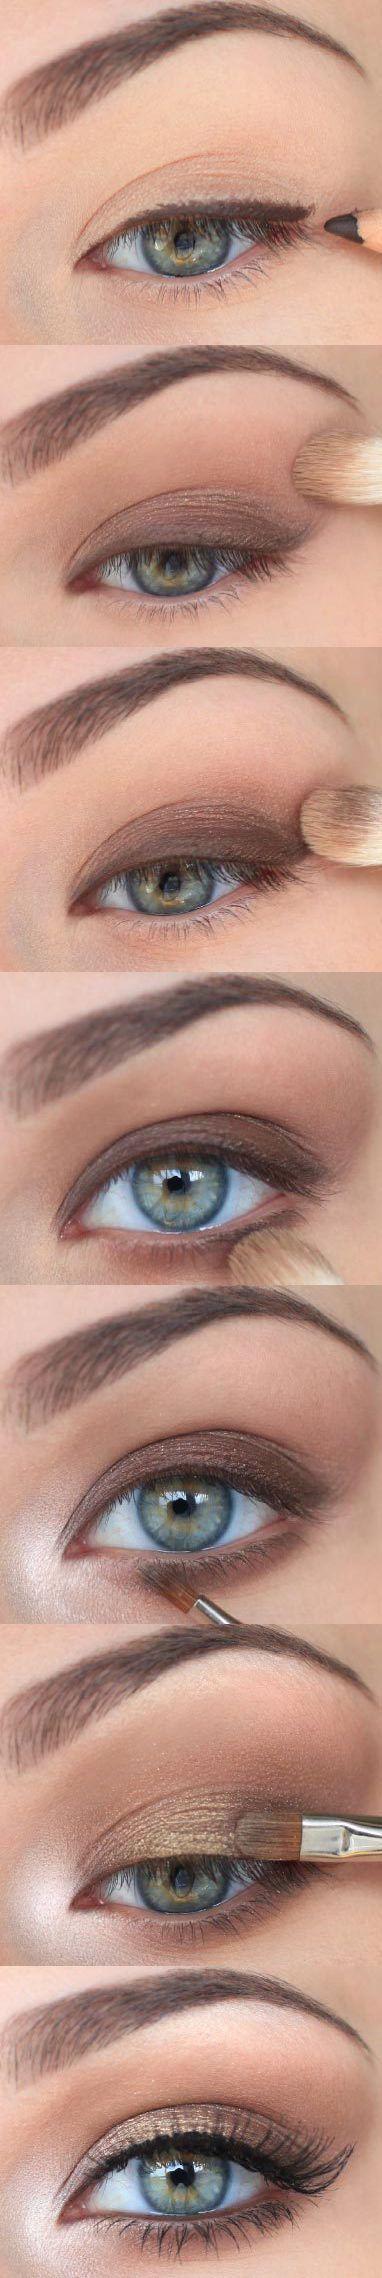 Photo of Schritt für Schritt Make-up-Ideen, Make-up-Tutorial für Anfänger, Make-up-Ide…